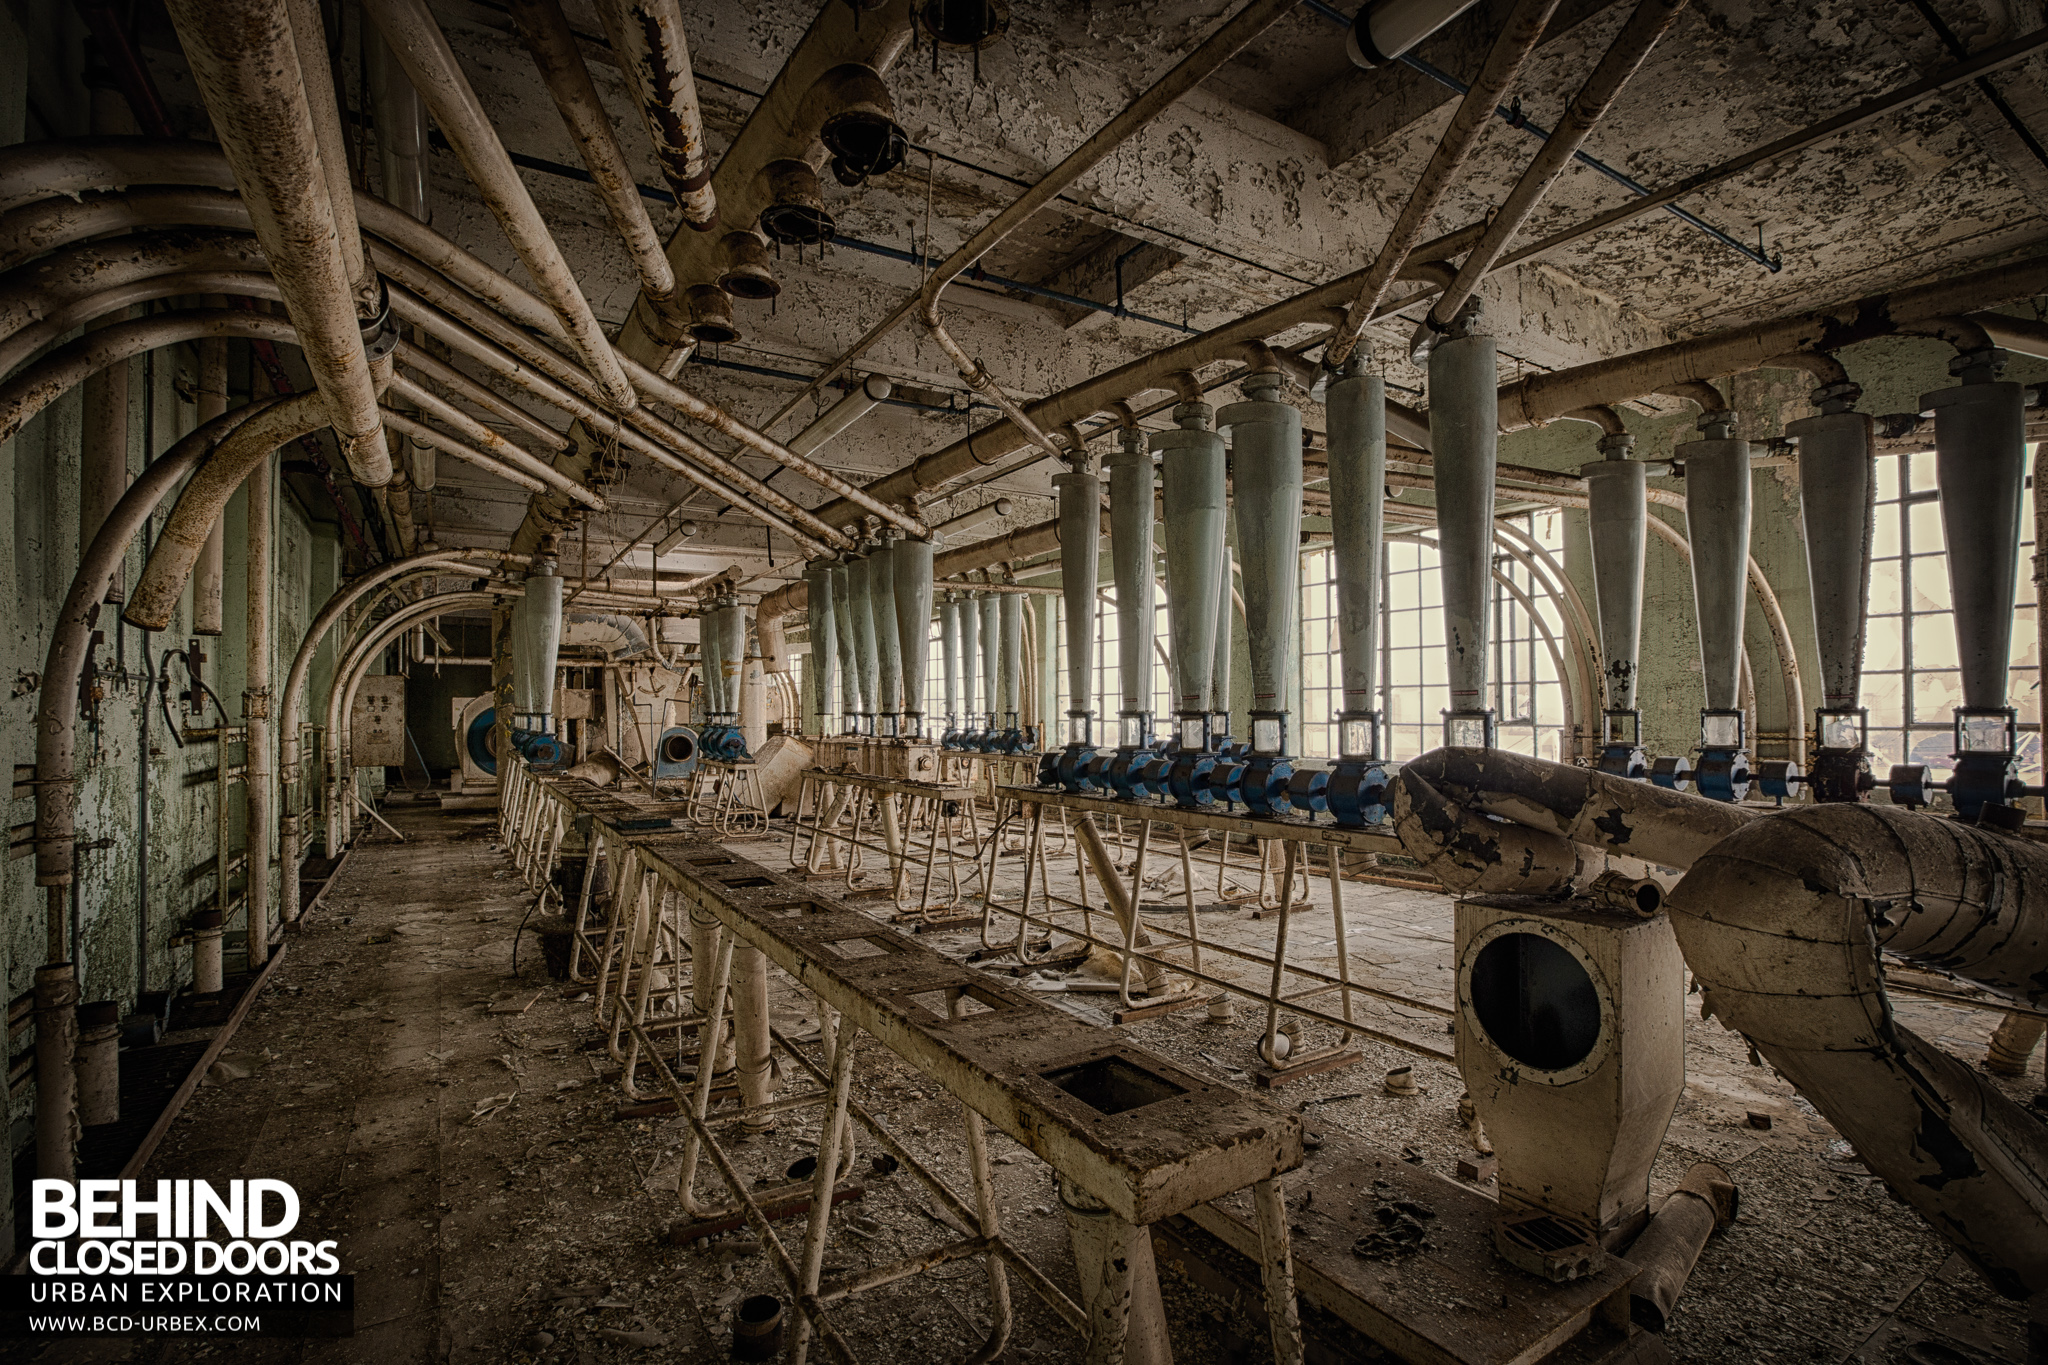 Spillers Millenium Mills London 187 Urbex Behind Closed